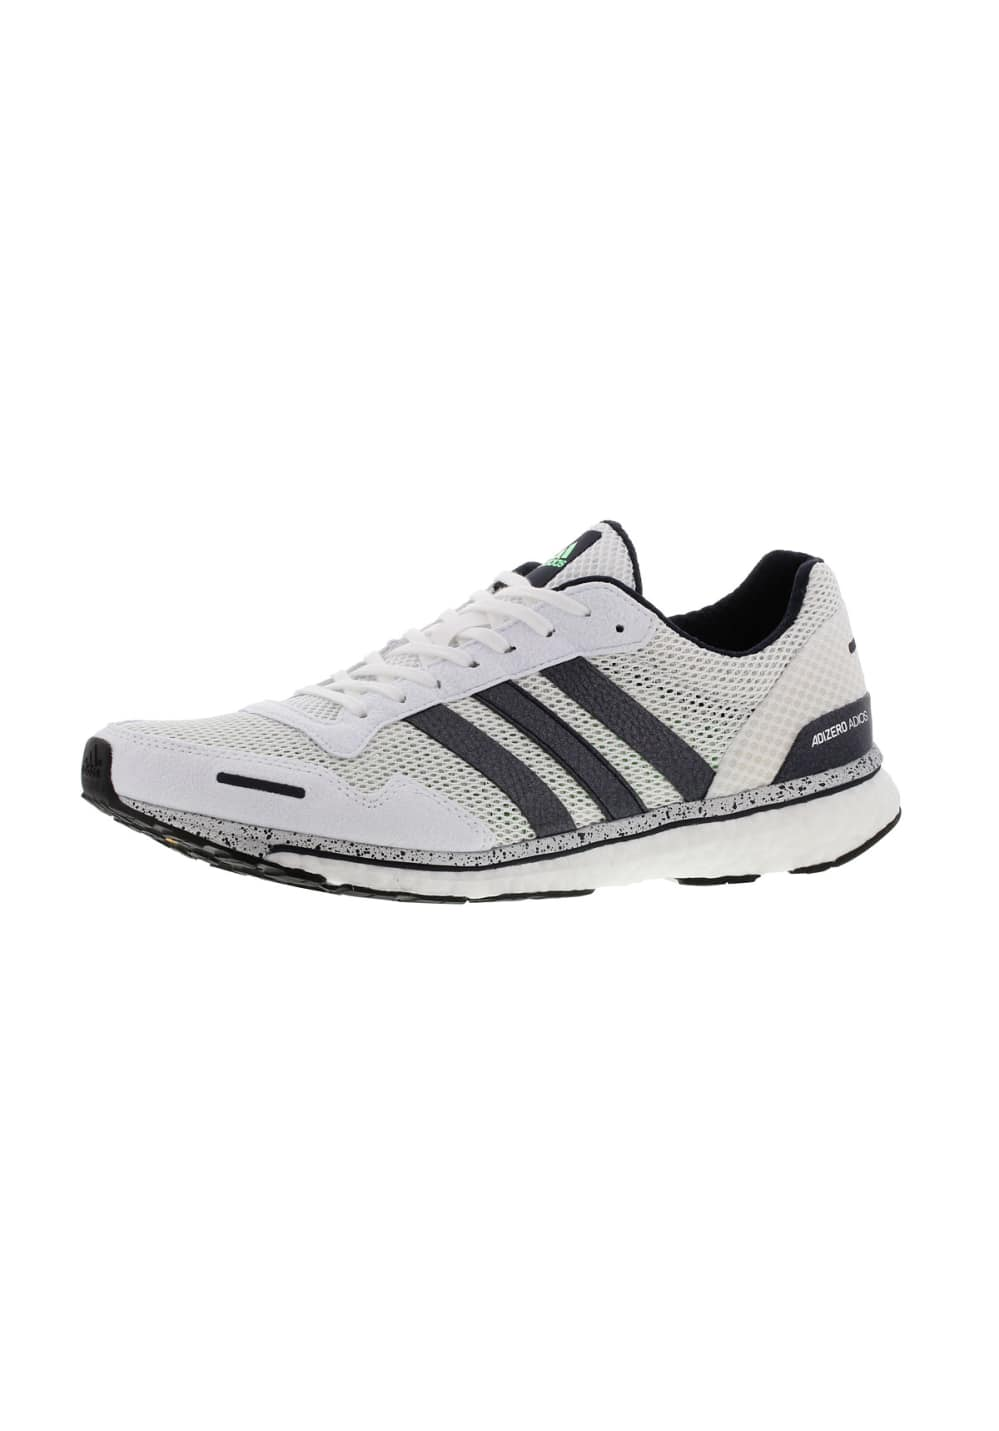 a5a3eb827 adidas Adizero Adios 3 - Running shoes for Men - White